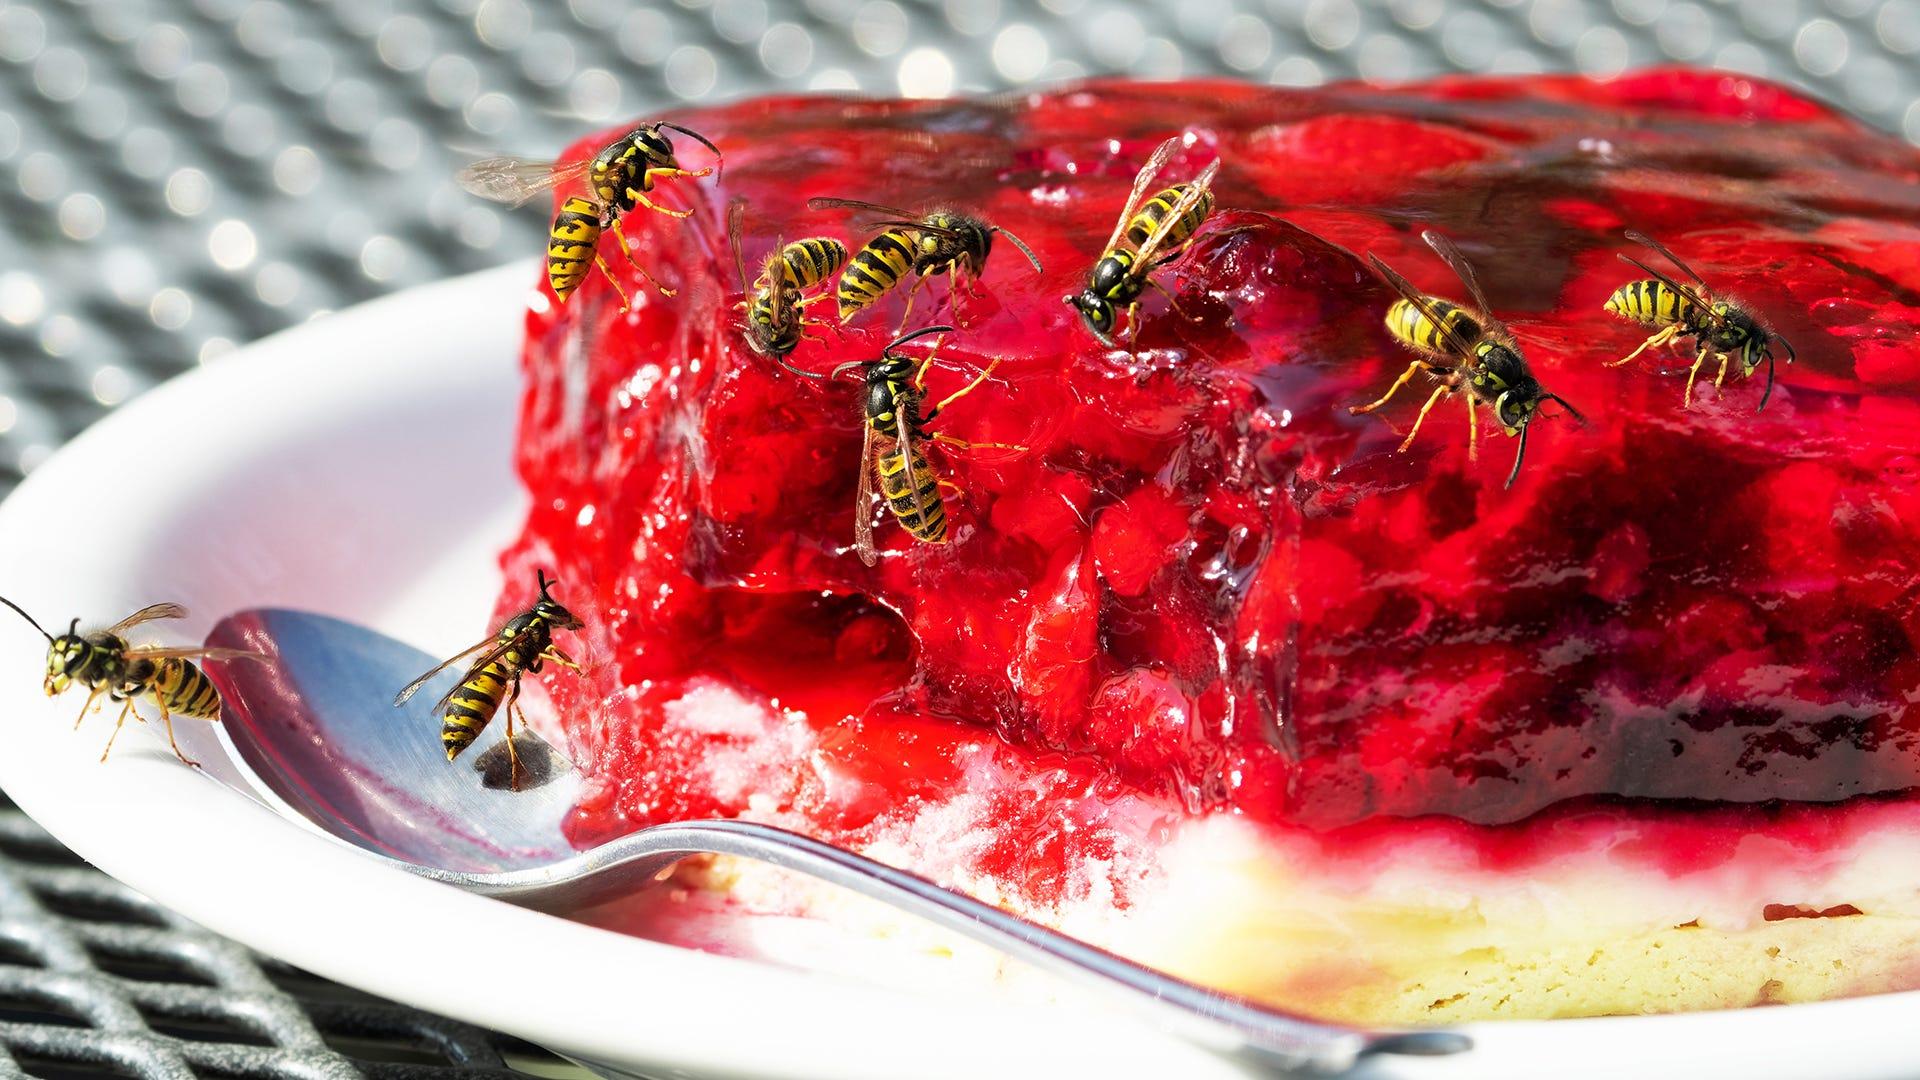 wasps eating